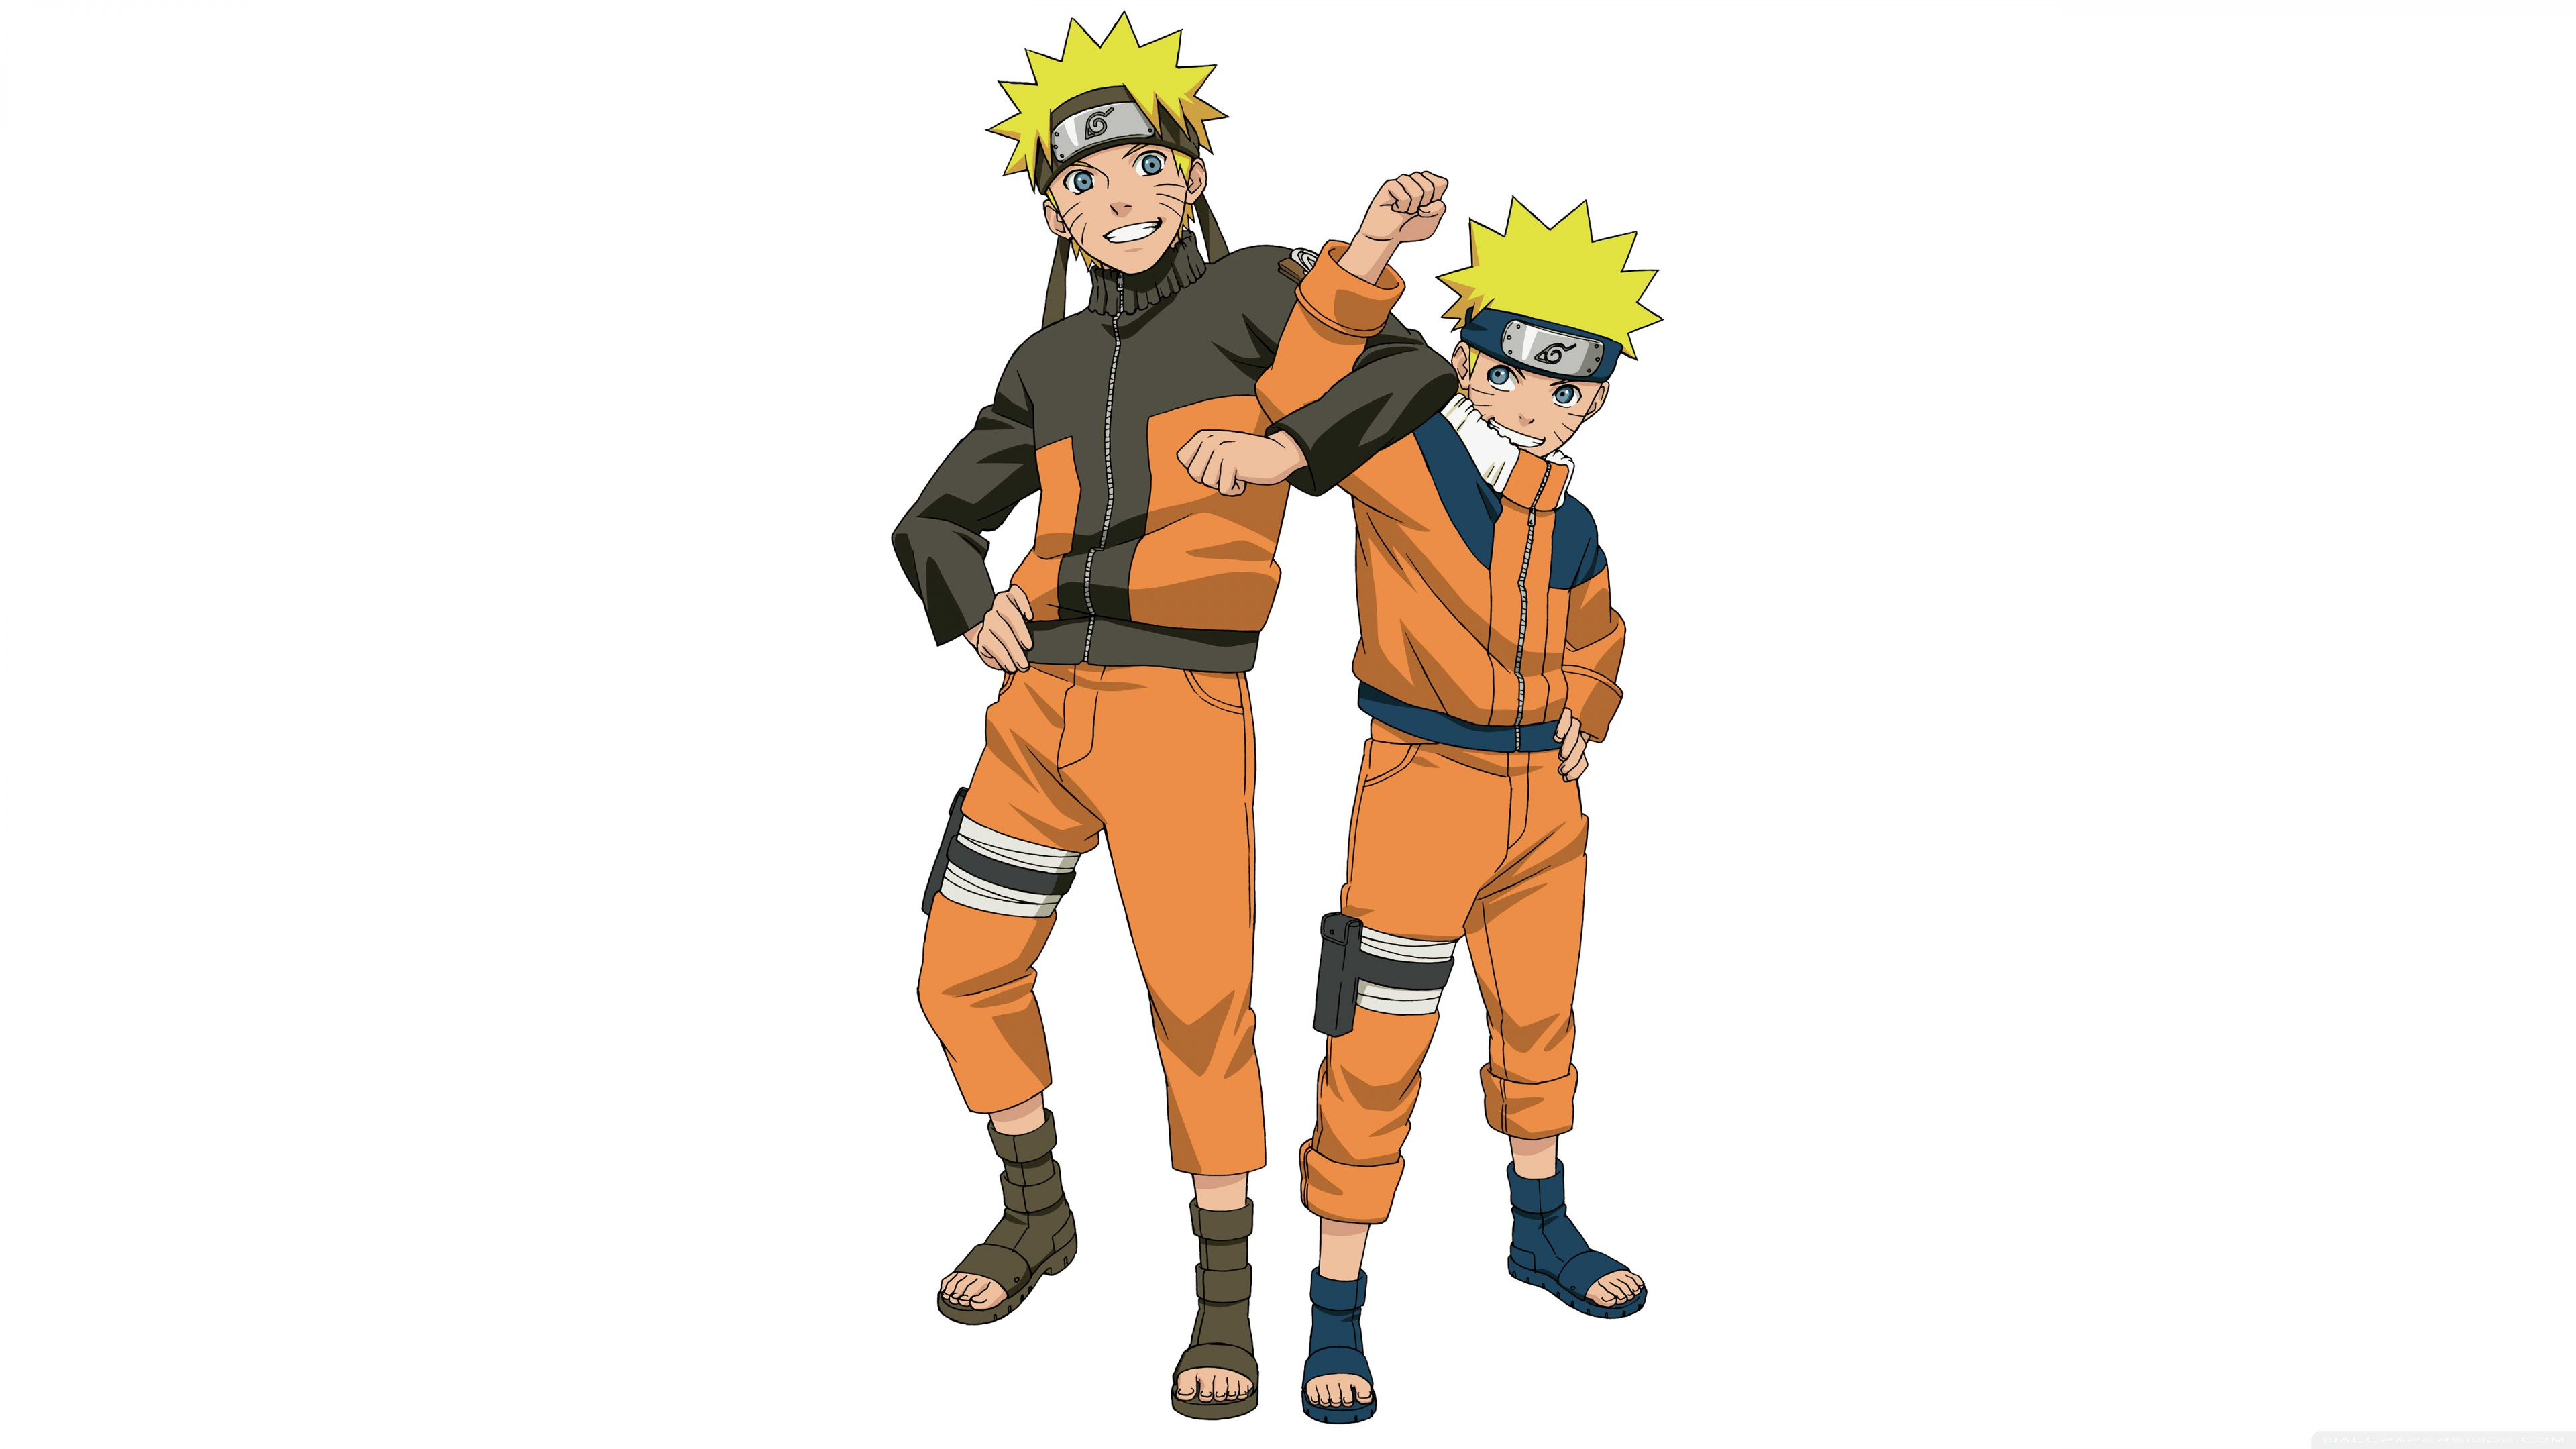 4K Naruto Wallpaper - WallpaperSafari